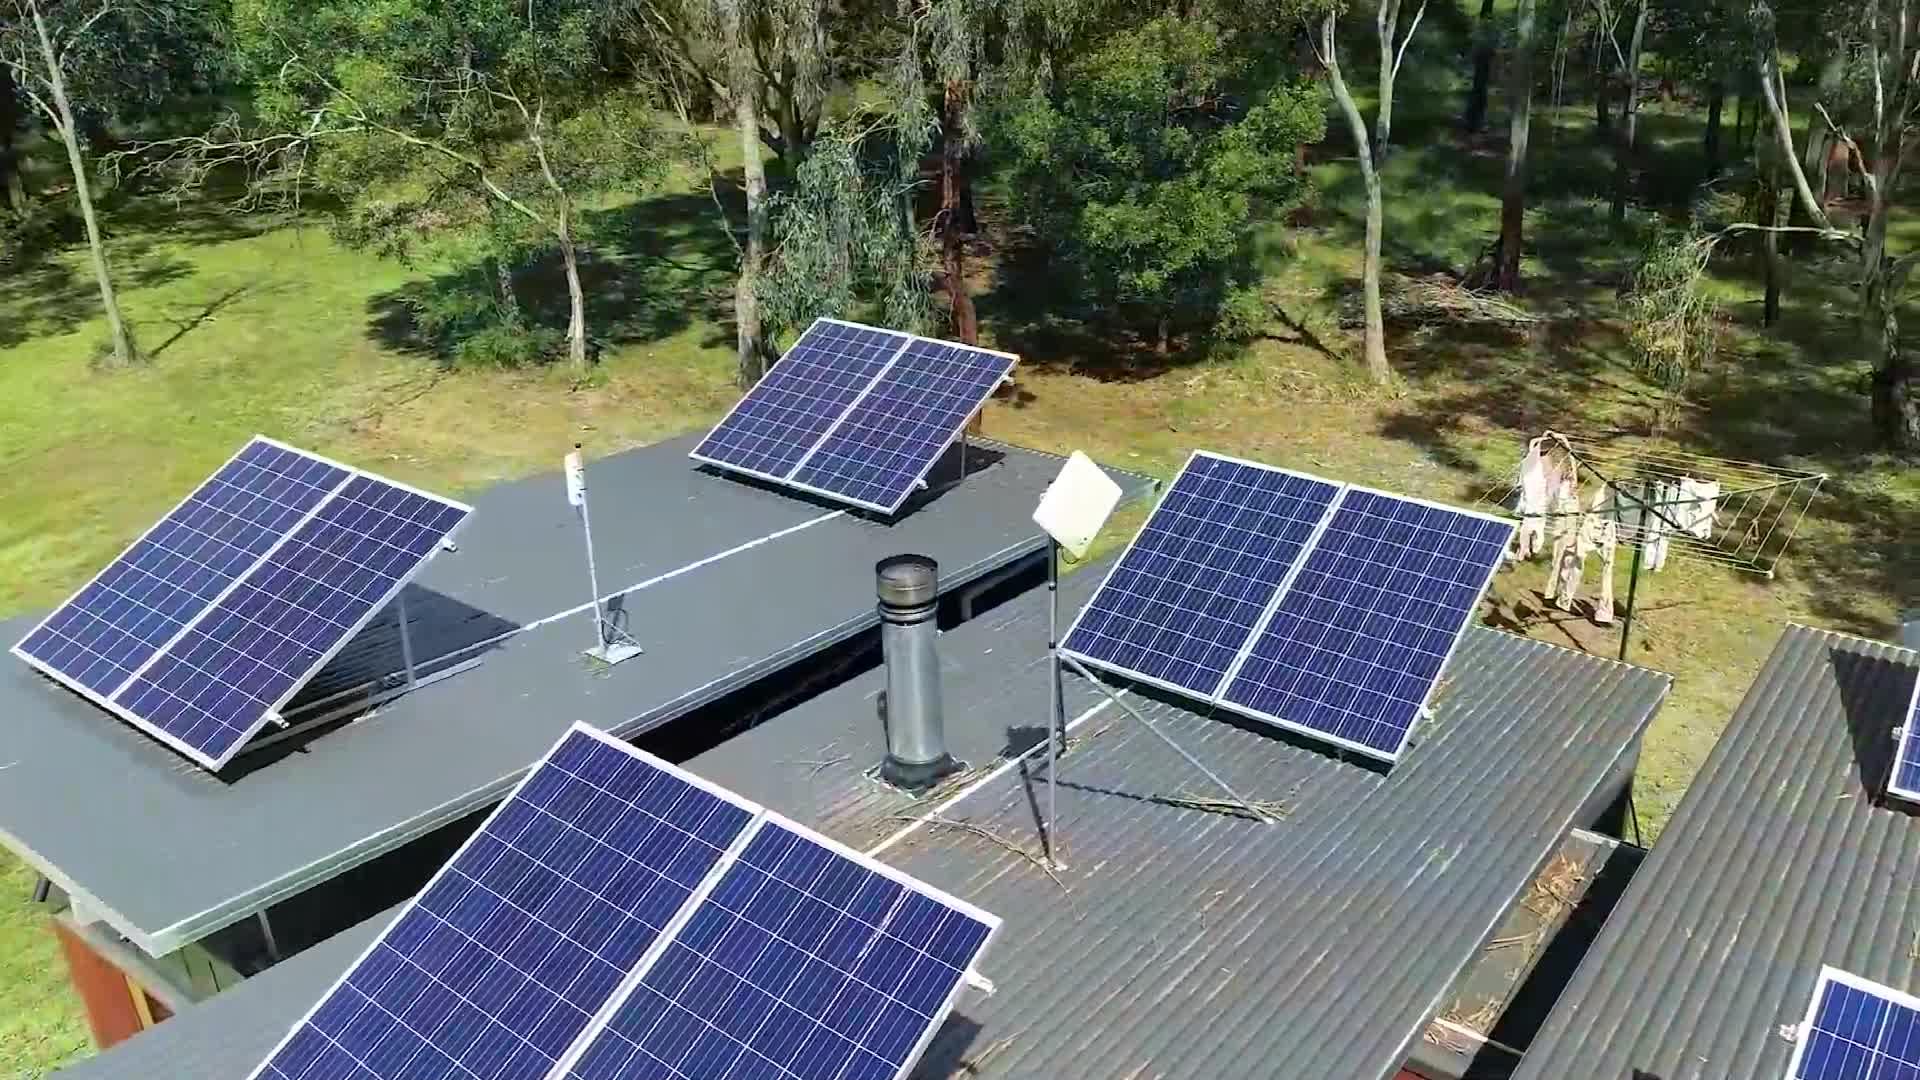 Komplette solar system grid gebunden 3KW 5KW 10KW hause solar energie system